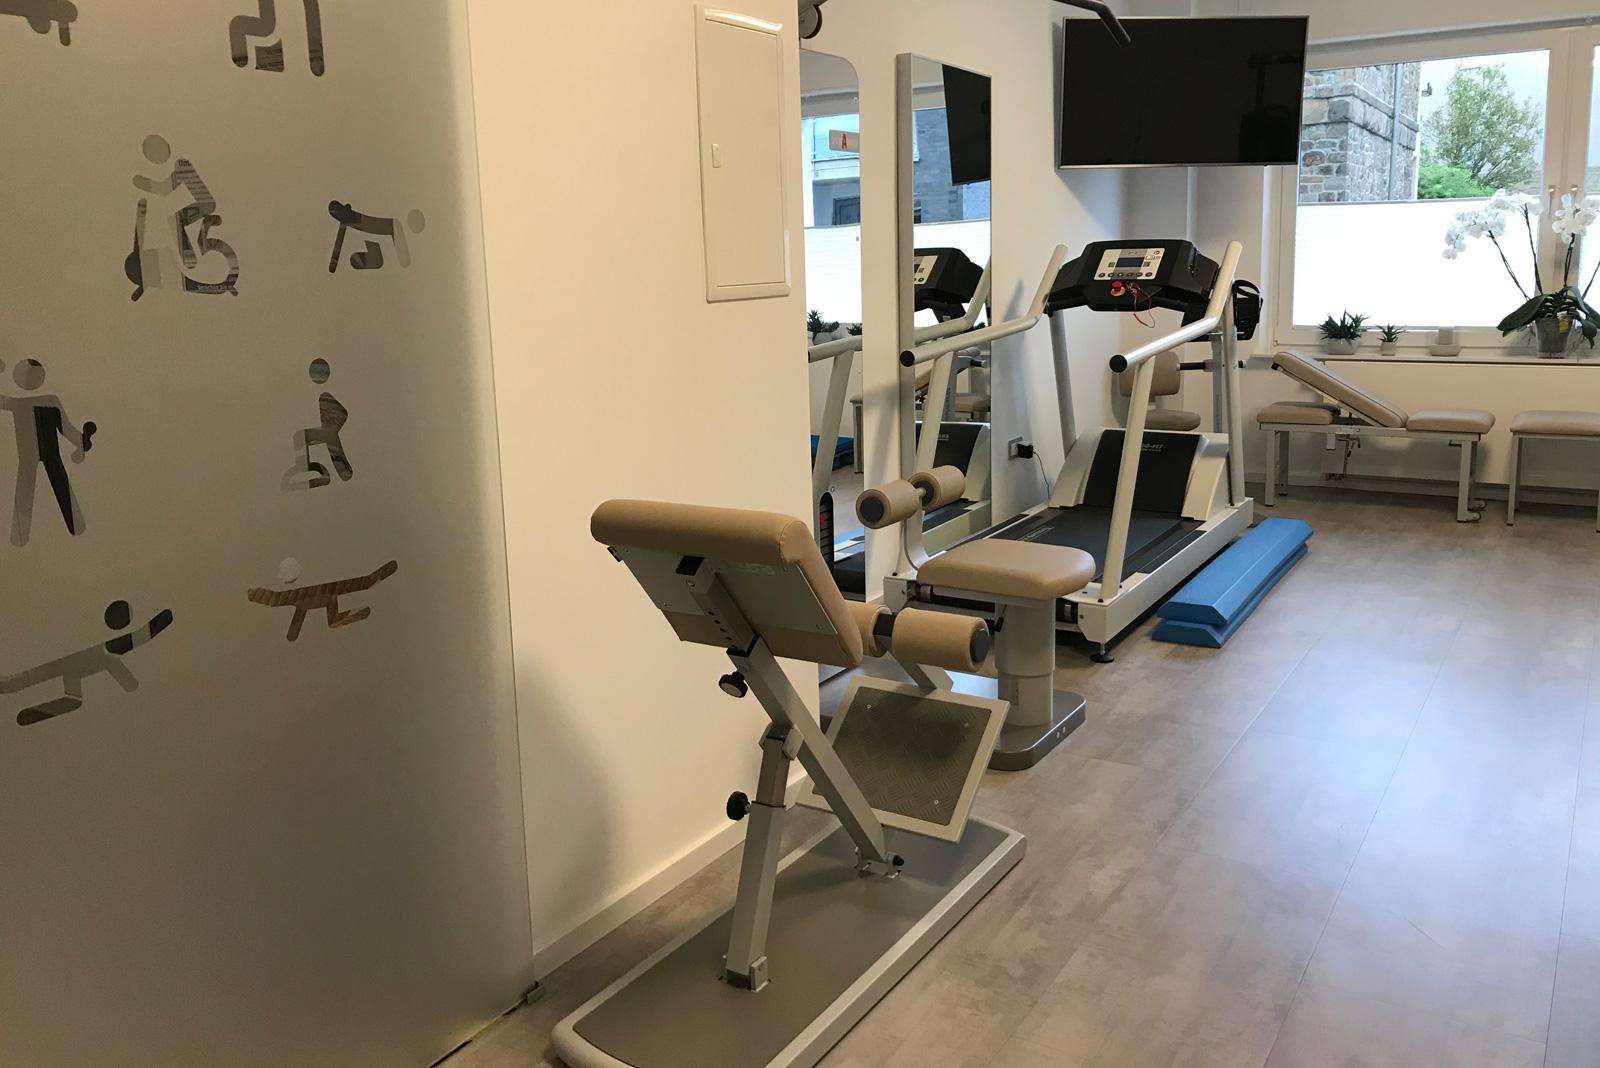 Trainingsraum für Krankengymnastik am Gerät